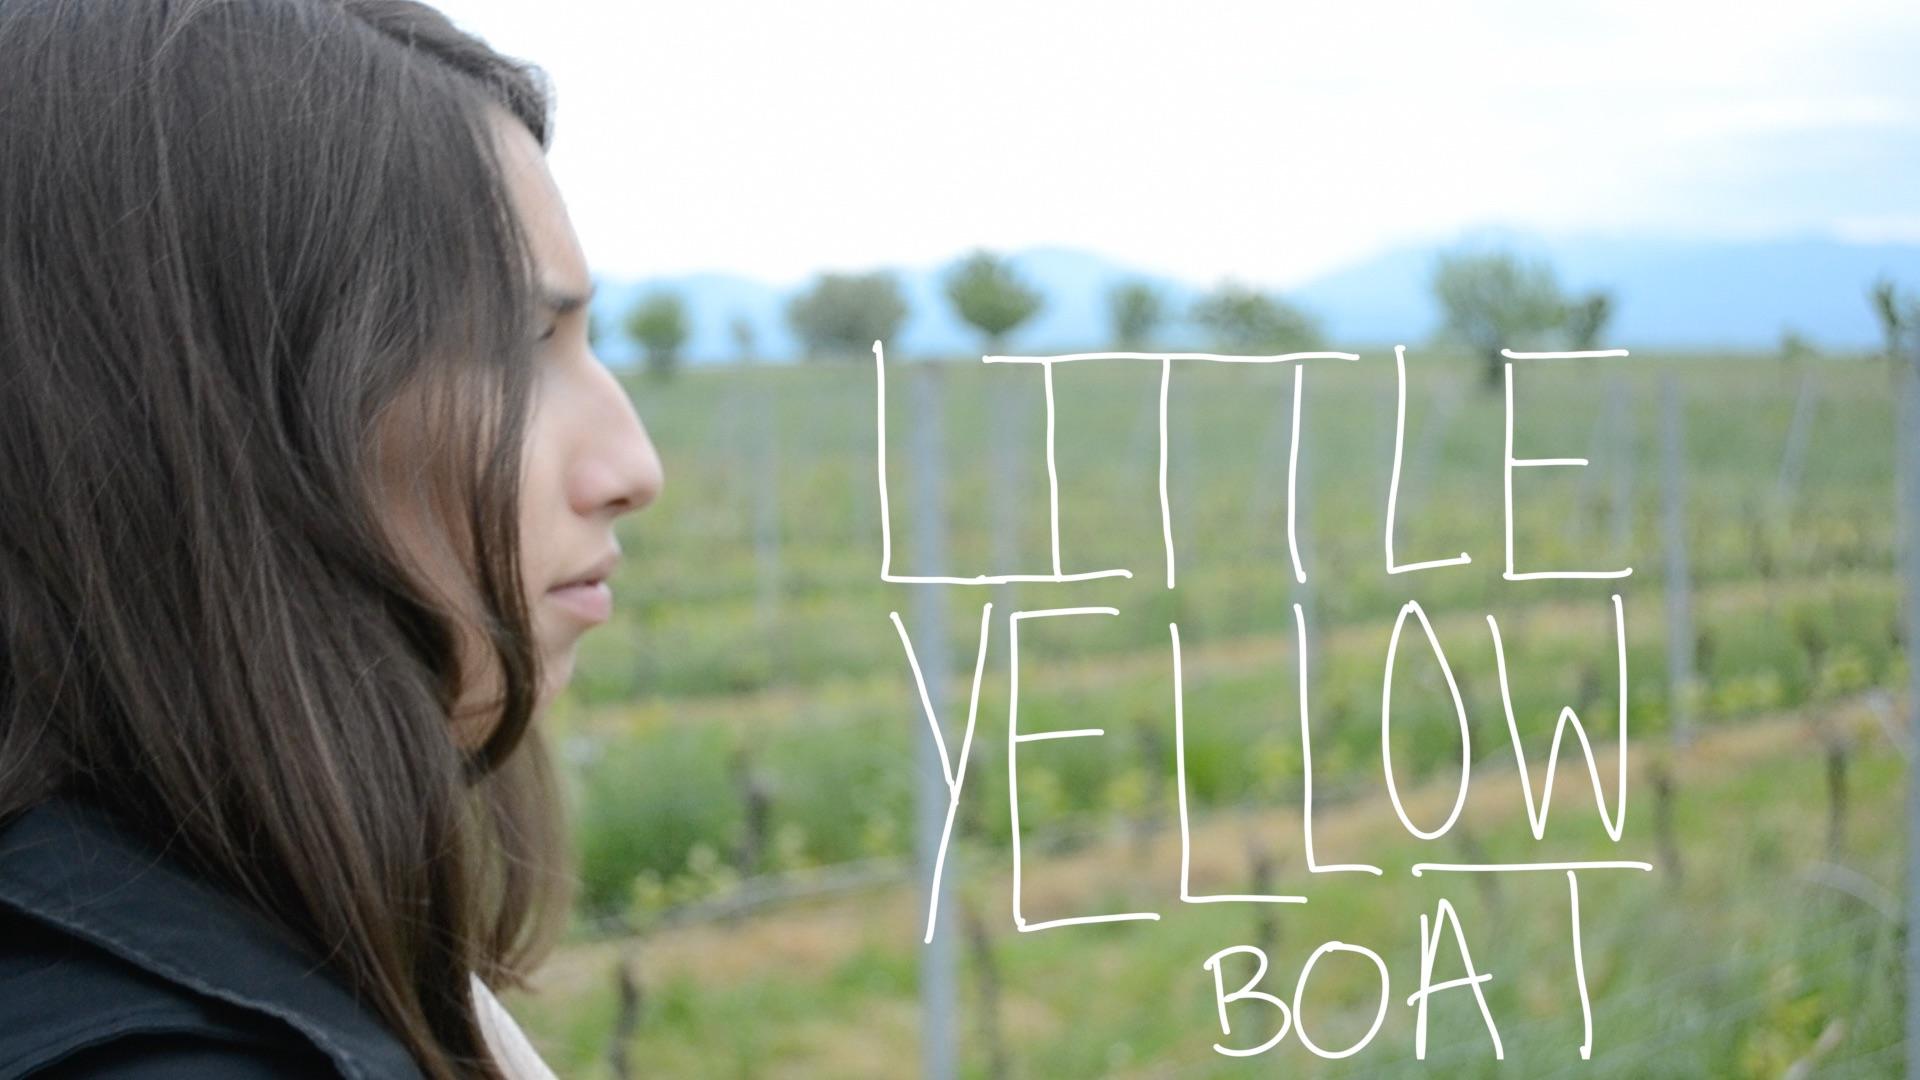 vineyard1lyb.jpg